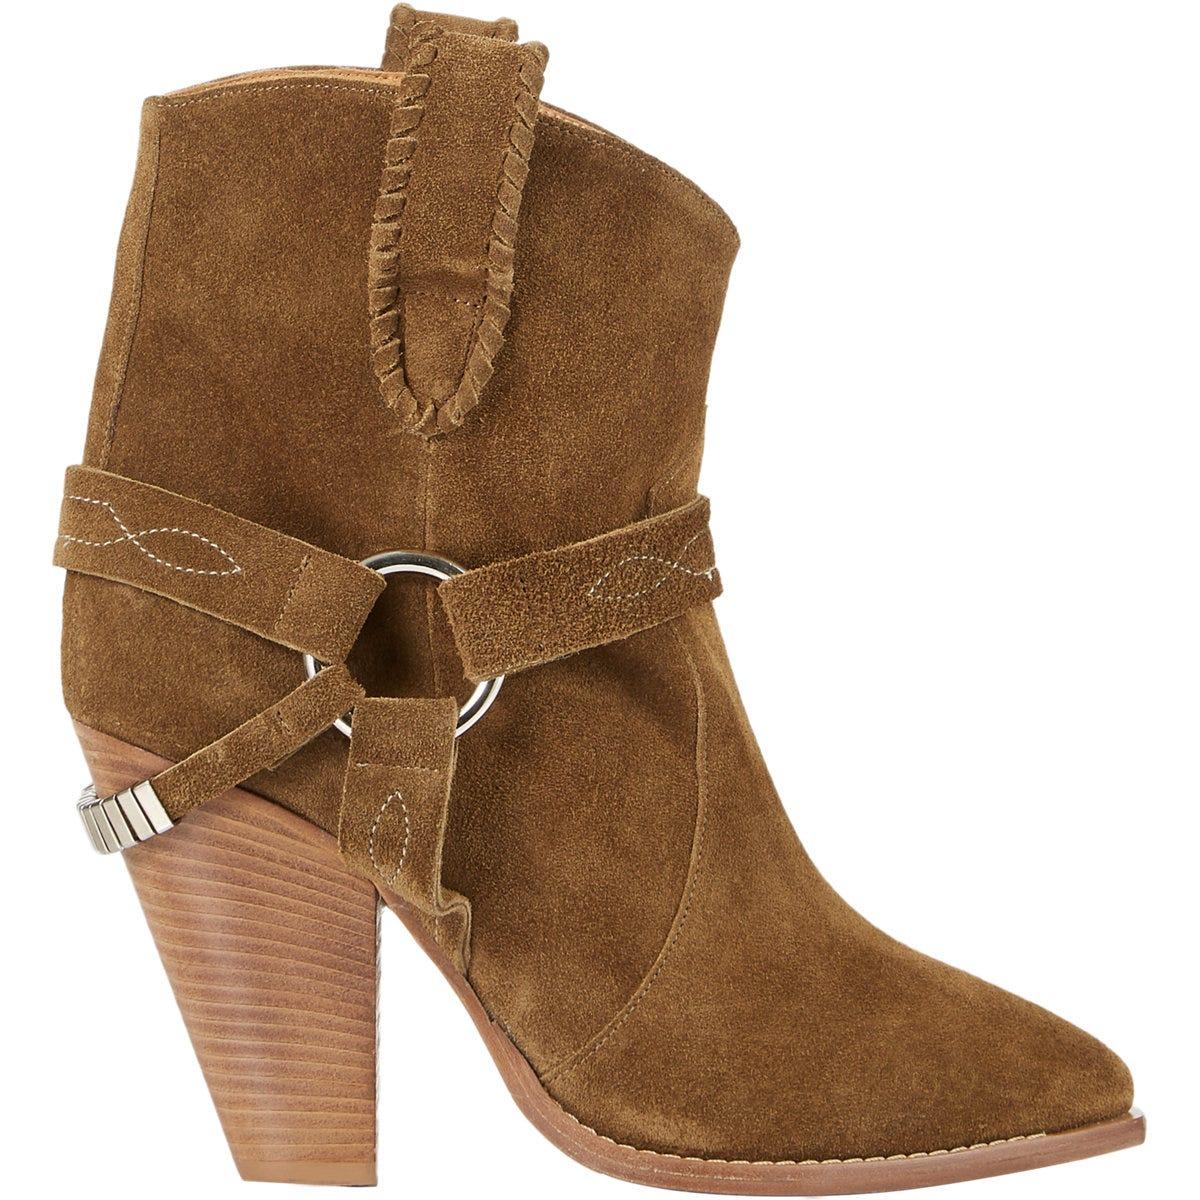 56025139efd3 Étoile Isabel Marant. Rawson Harness Boots